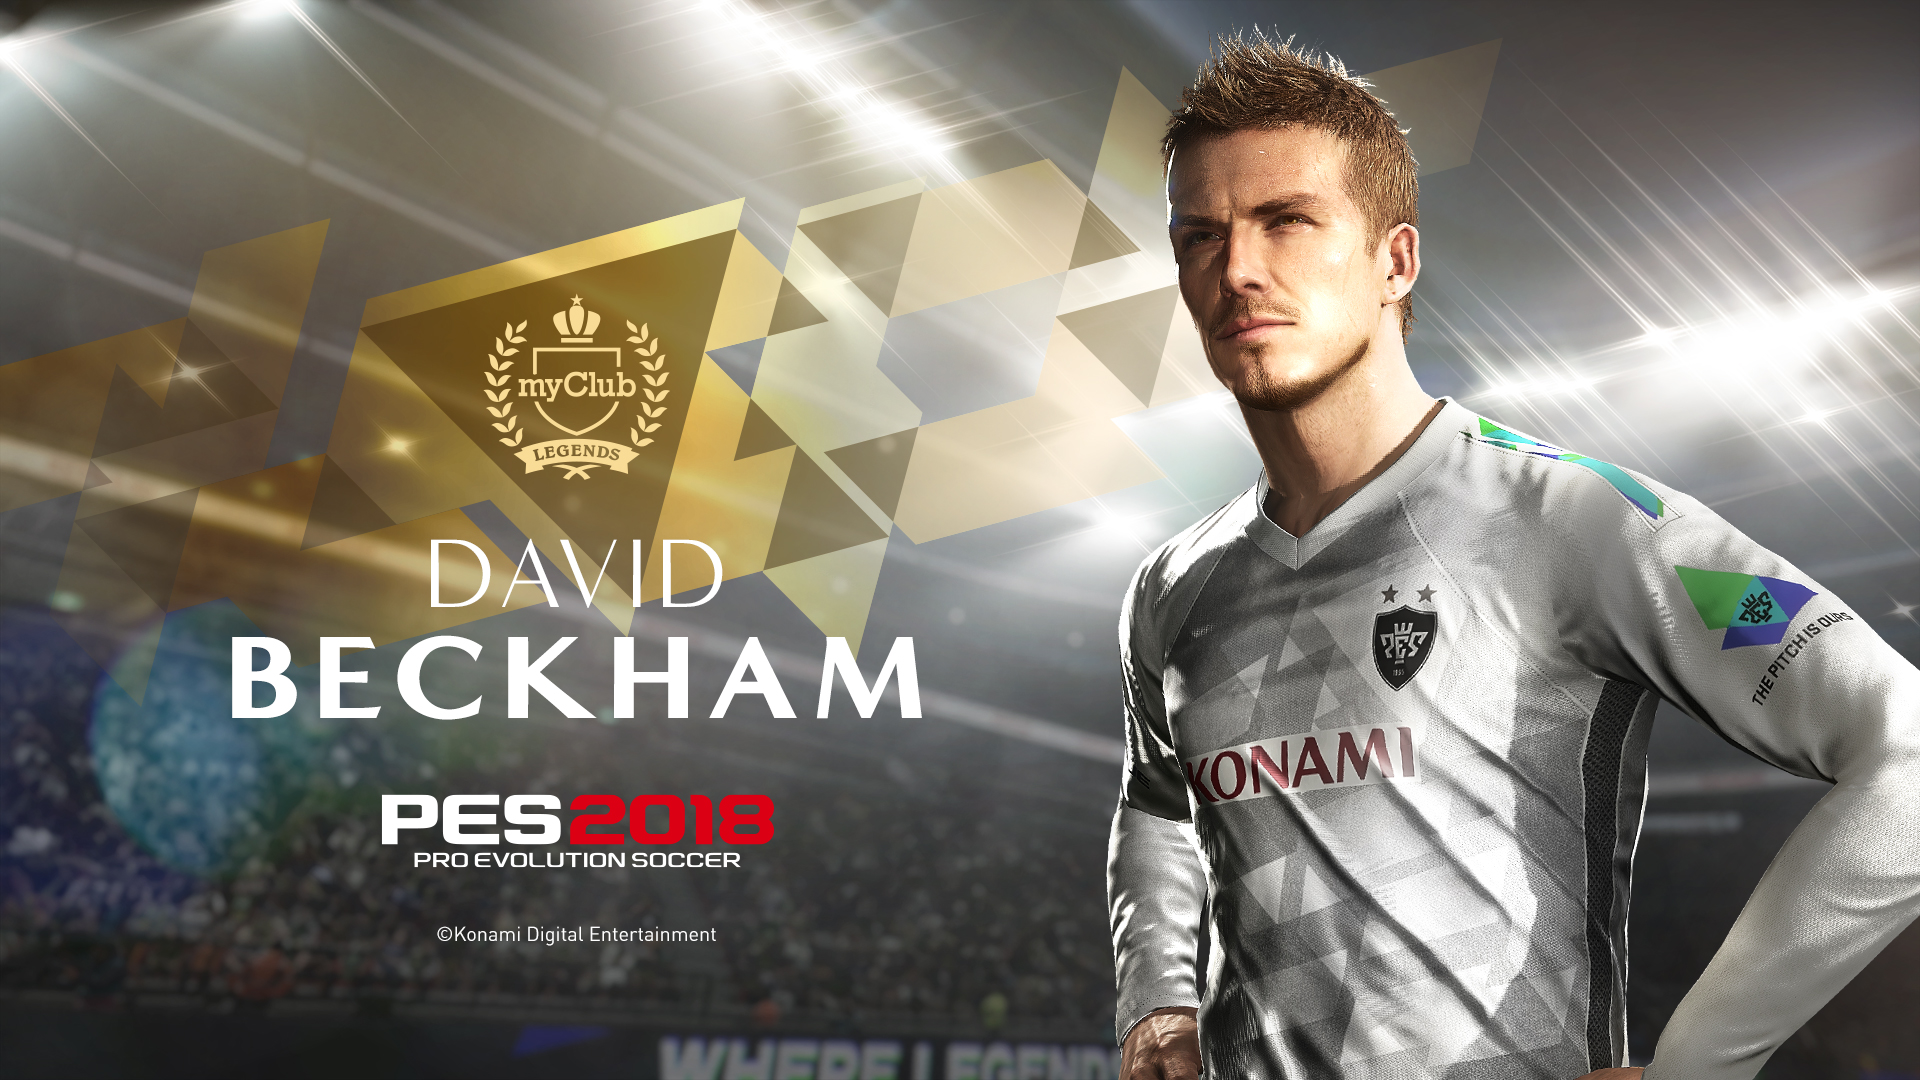 David Beckham PES 2018